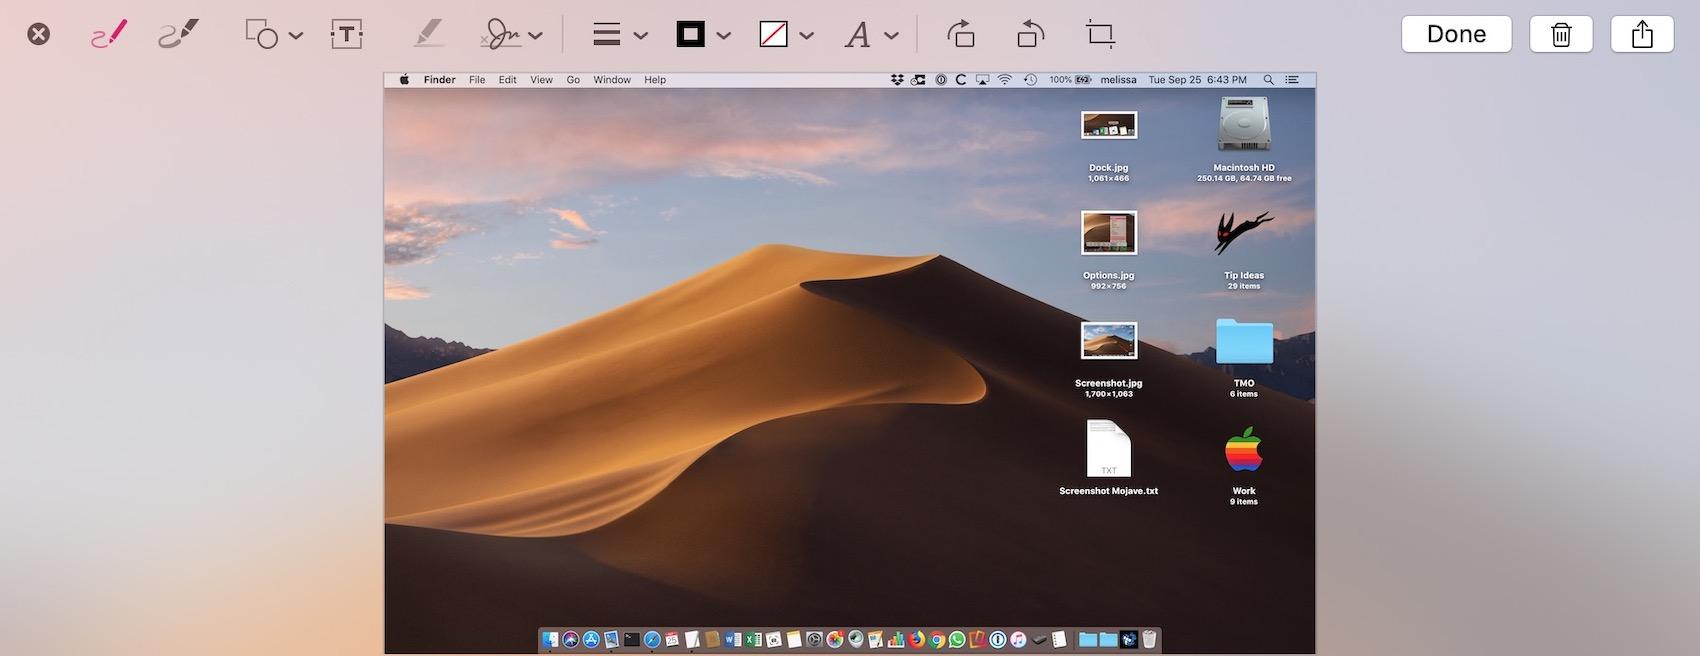 Markup Toolbar for Screenshots in macOS Mojave